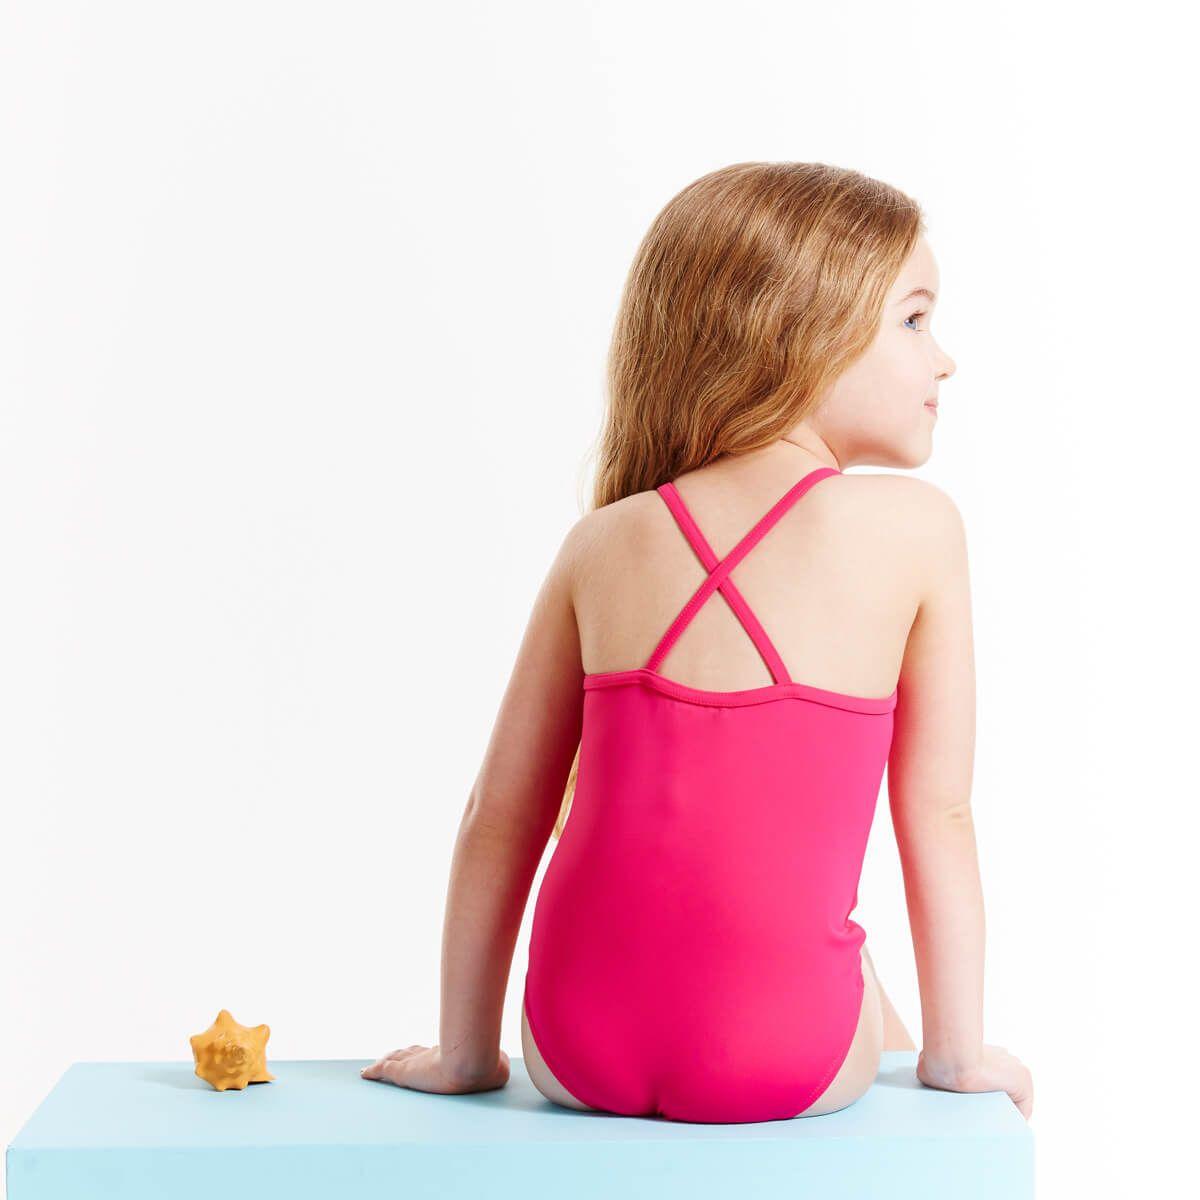 515a2f3e75ef0 ... Designer Swimming Costume De Birdy